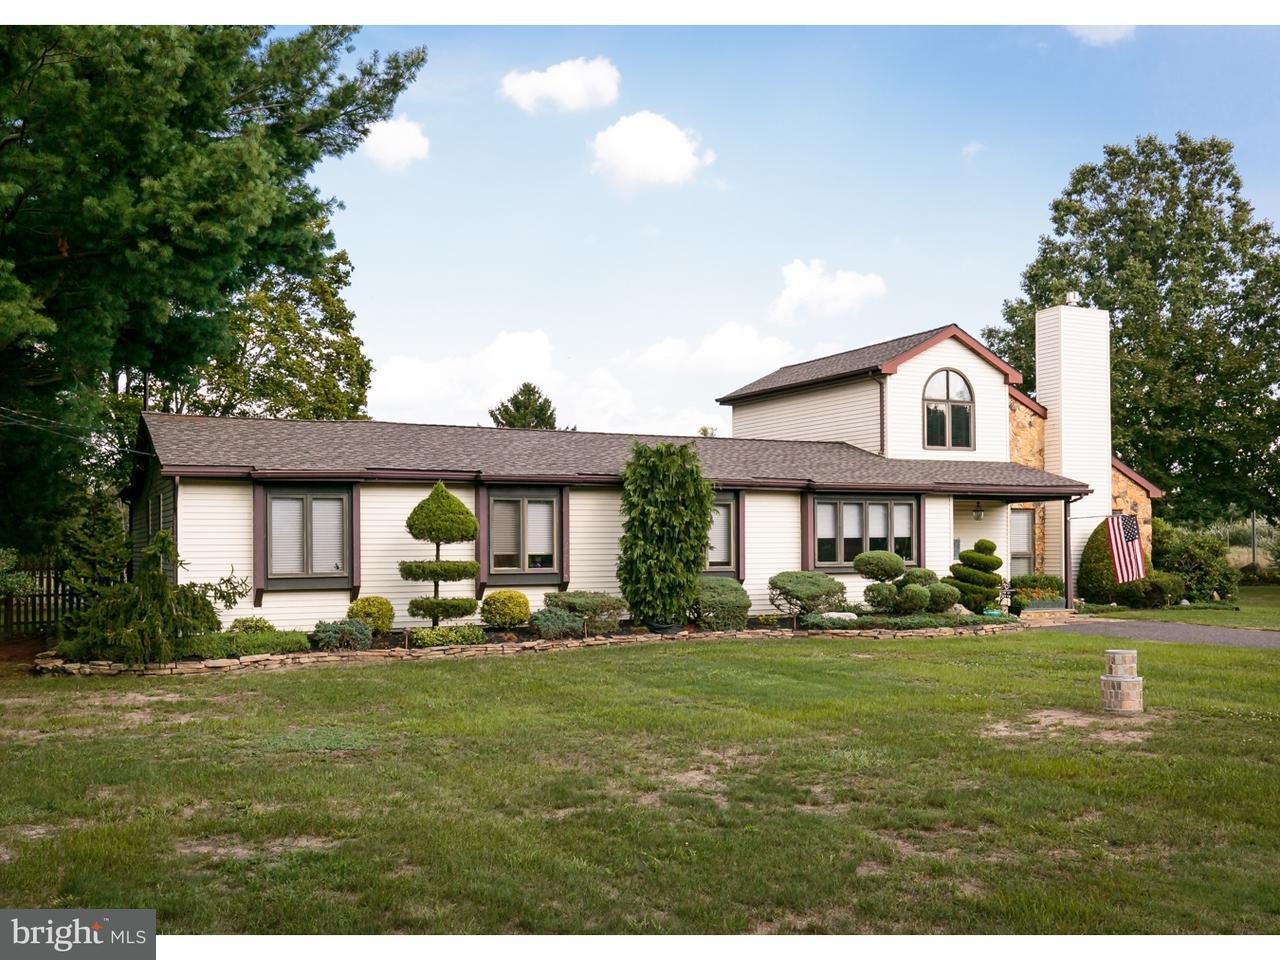 独户住宅 为 销售 在 326 OLD WHITE HORSE PIKE Waterford Works, 新泽西州 08089 美国